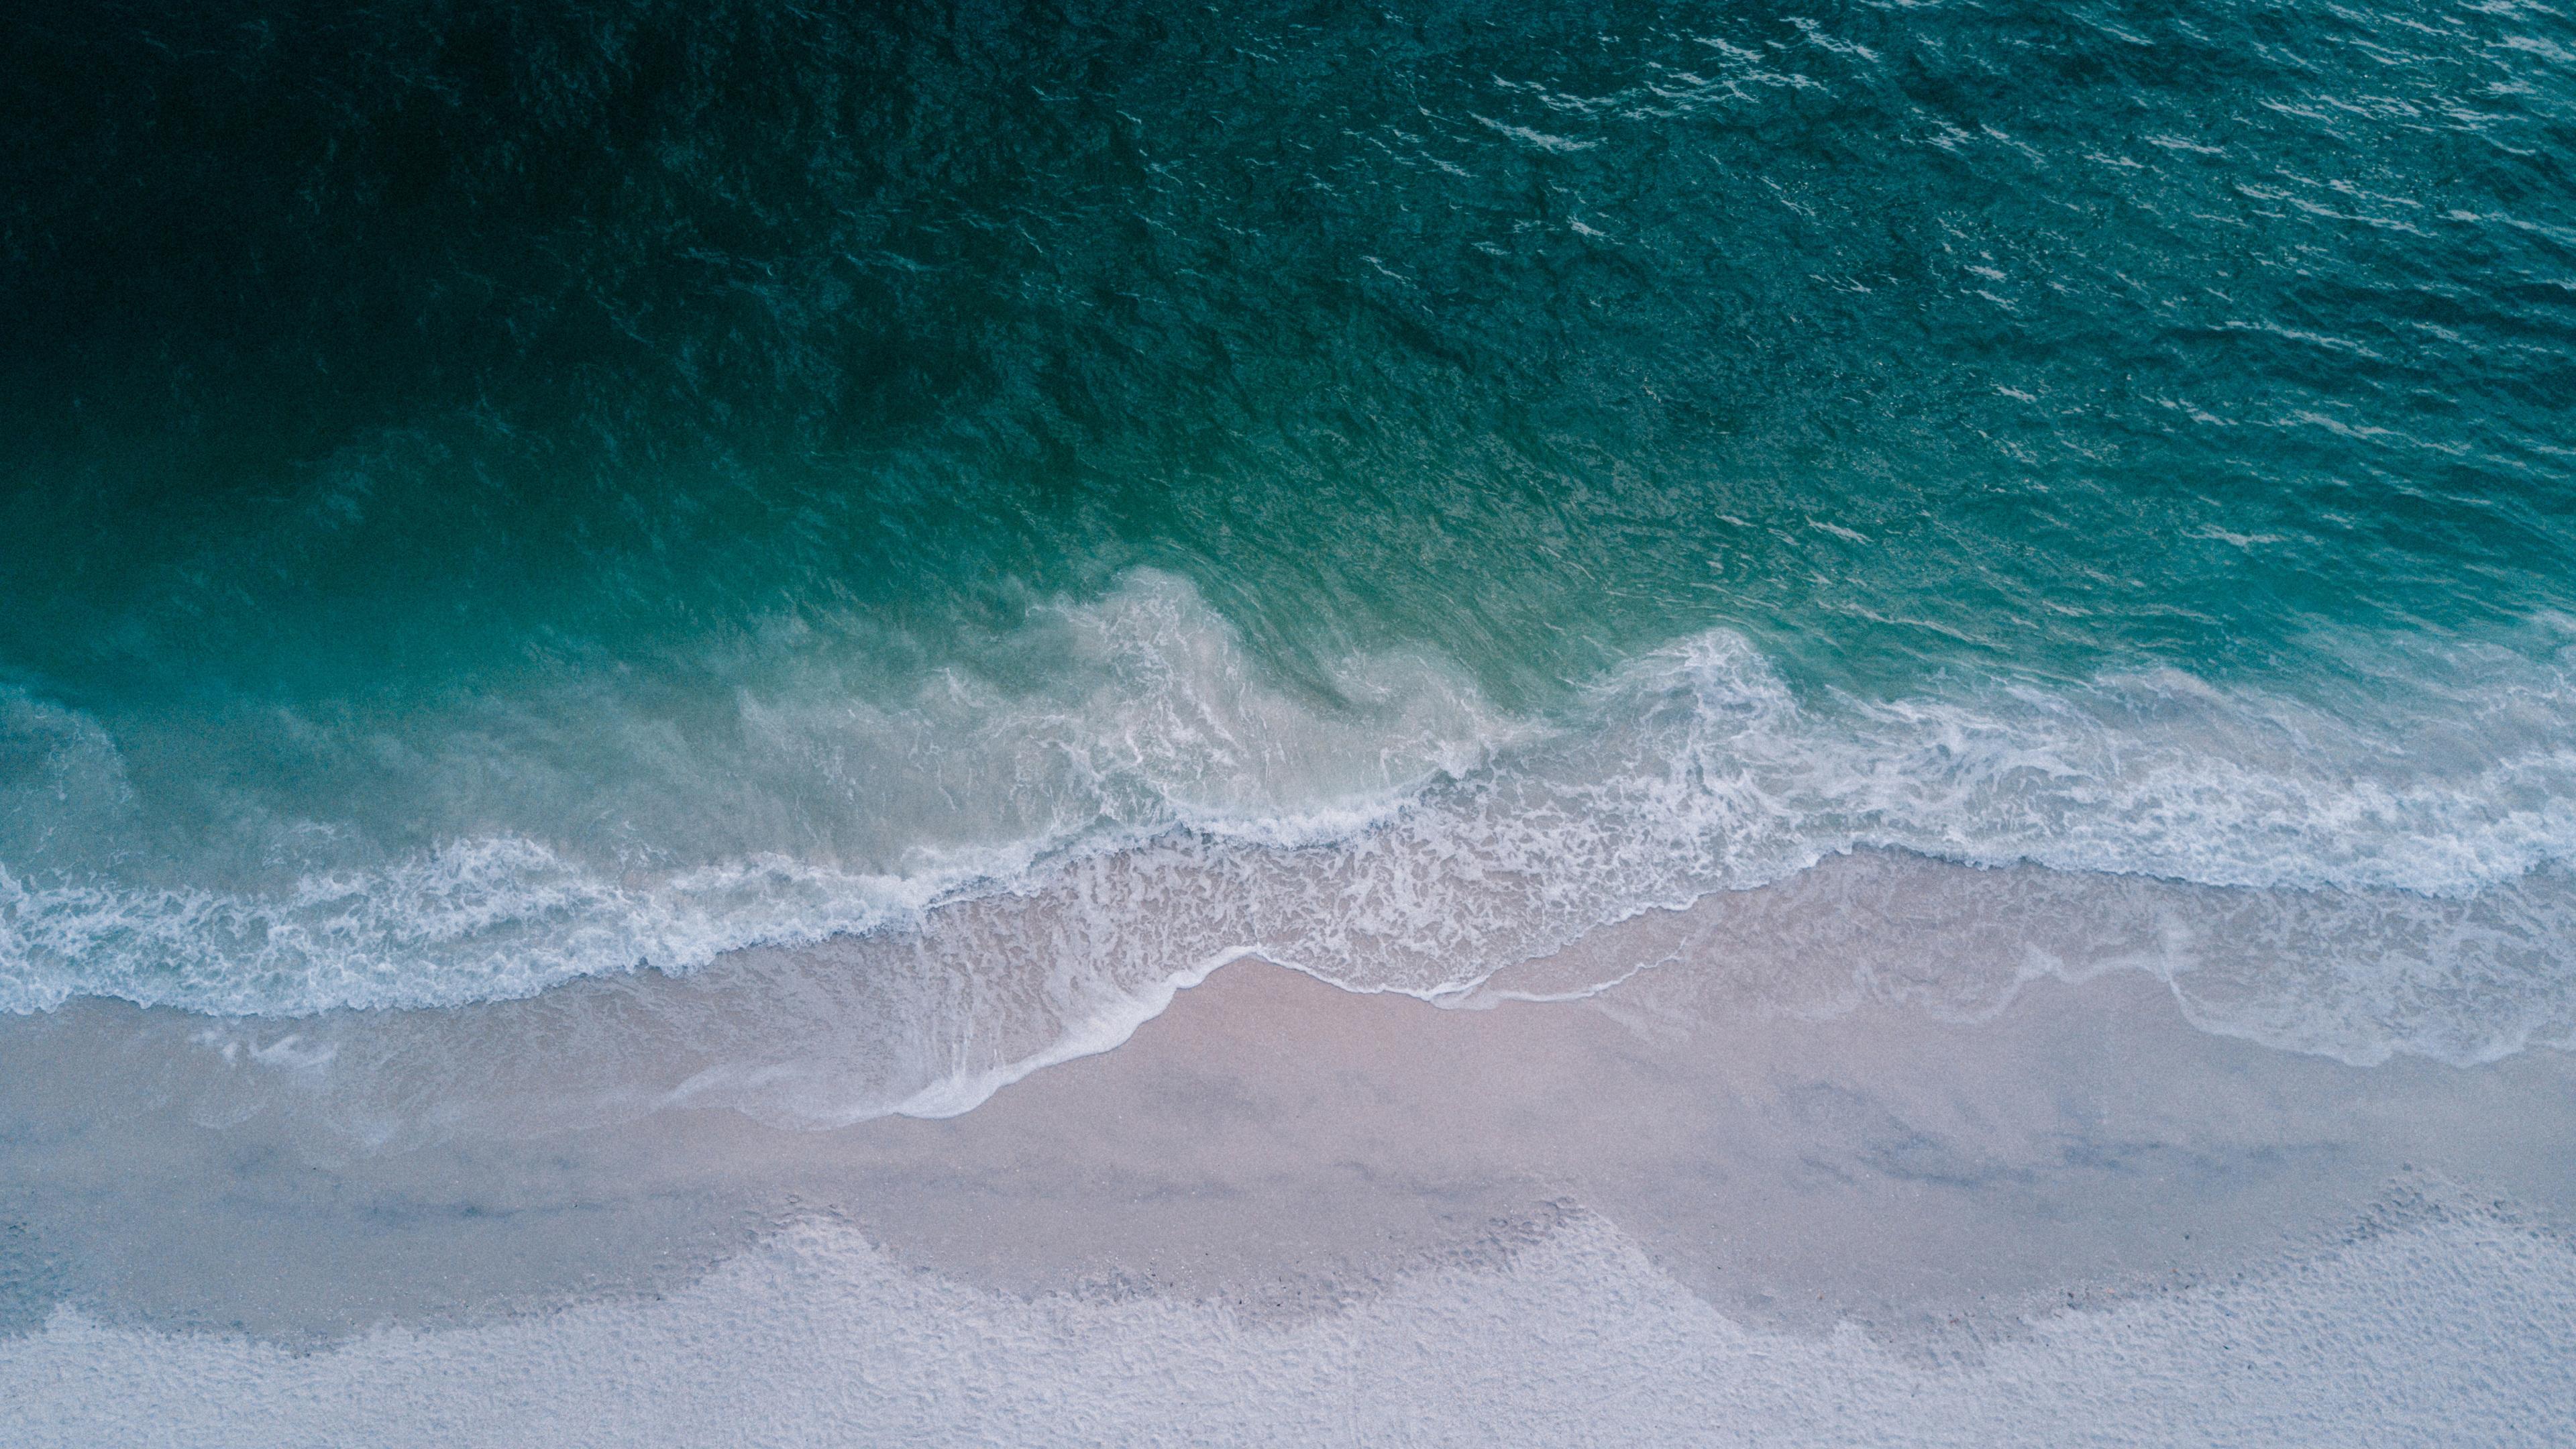 seashore top view beach 4k 1540135853 - Seashore Top View Beach 4k - waves wallpapers, seashore wallpapers, seascape wallpapers, nature wallpapers, hd-wallpapers, beach wallpapers, 4k-wallpapers